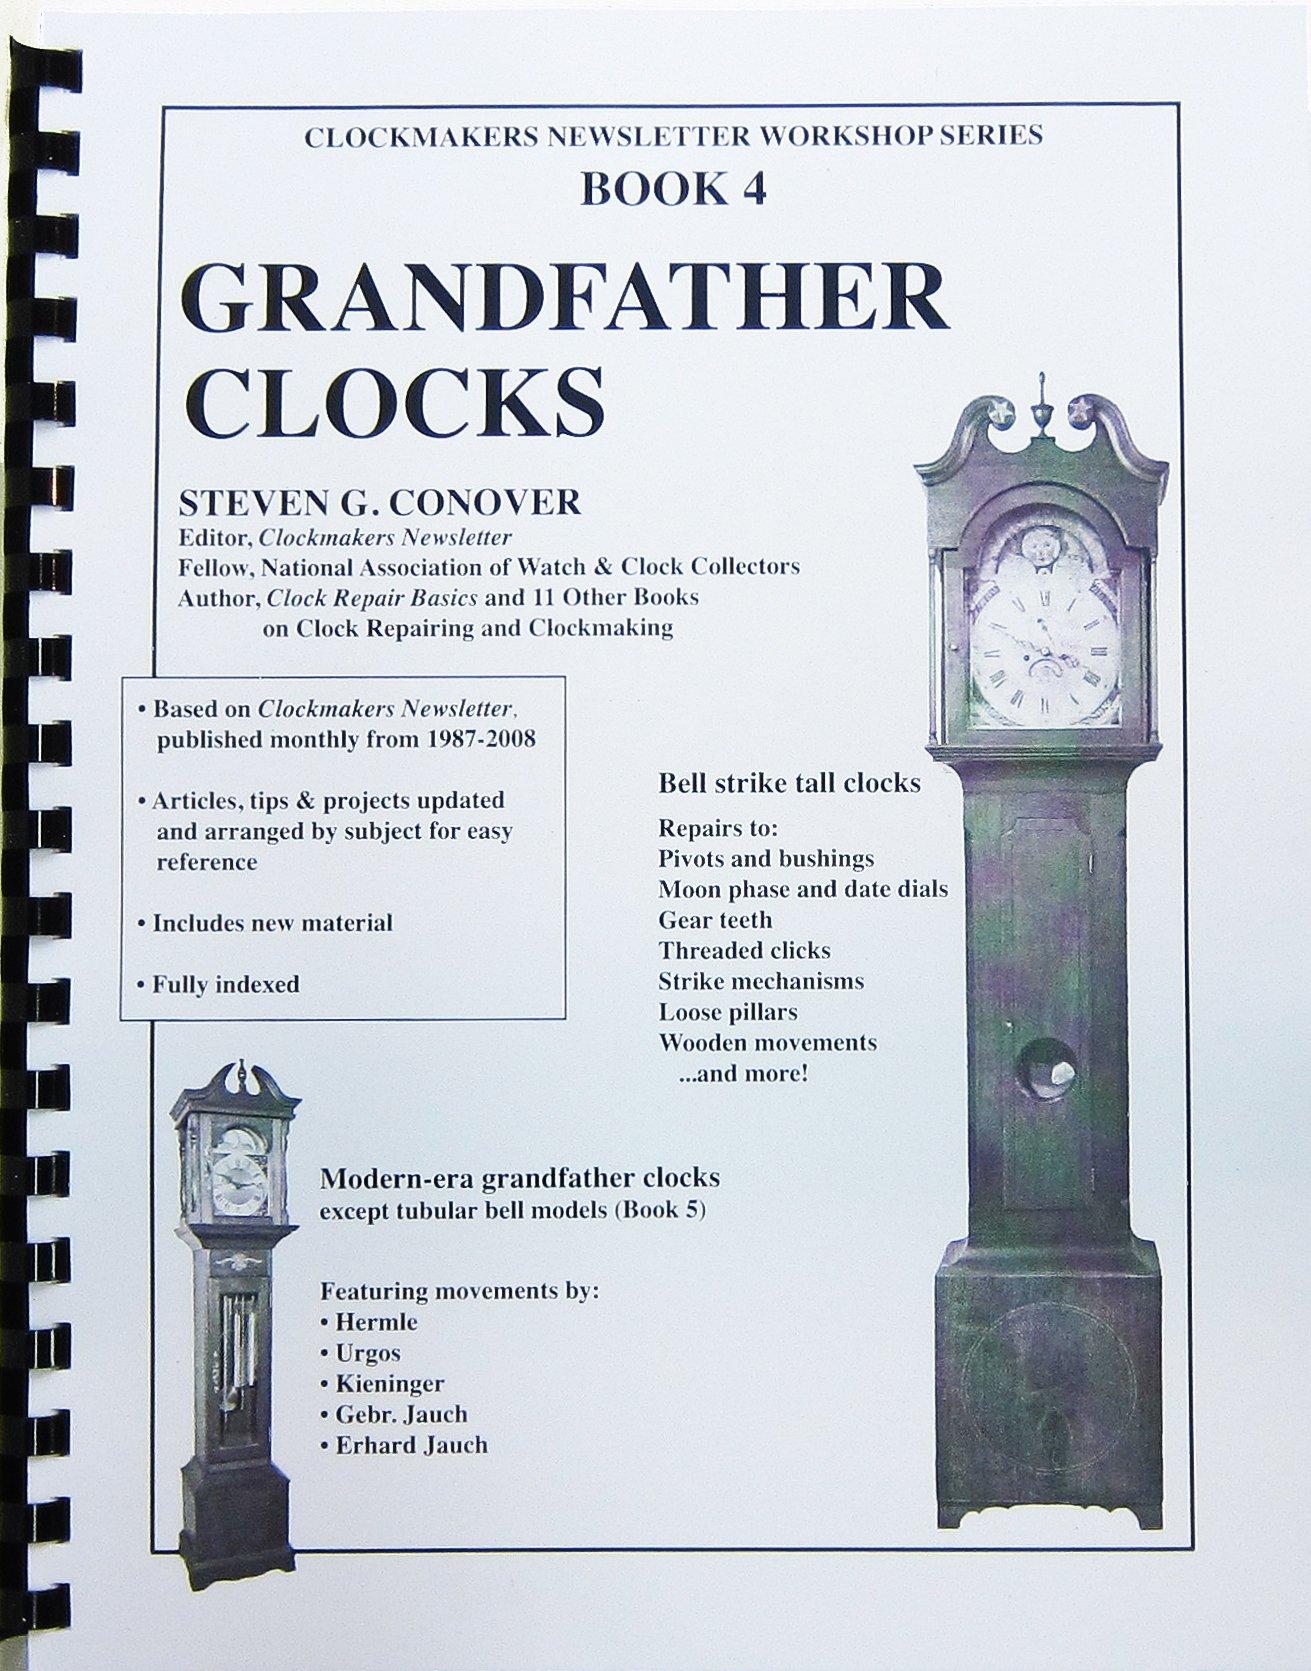 Book 4 Grandfather Clocks: Clockmakers Newsletter Workshop Series: Amazon.es: Steven G. Conover: Libros